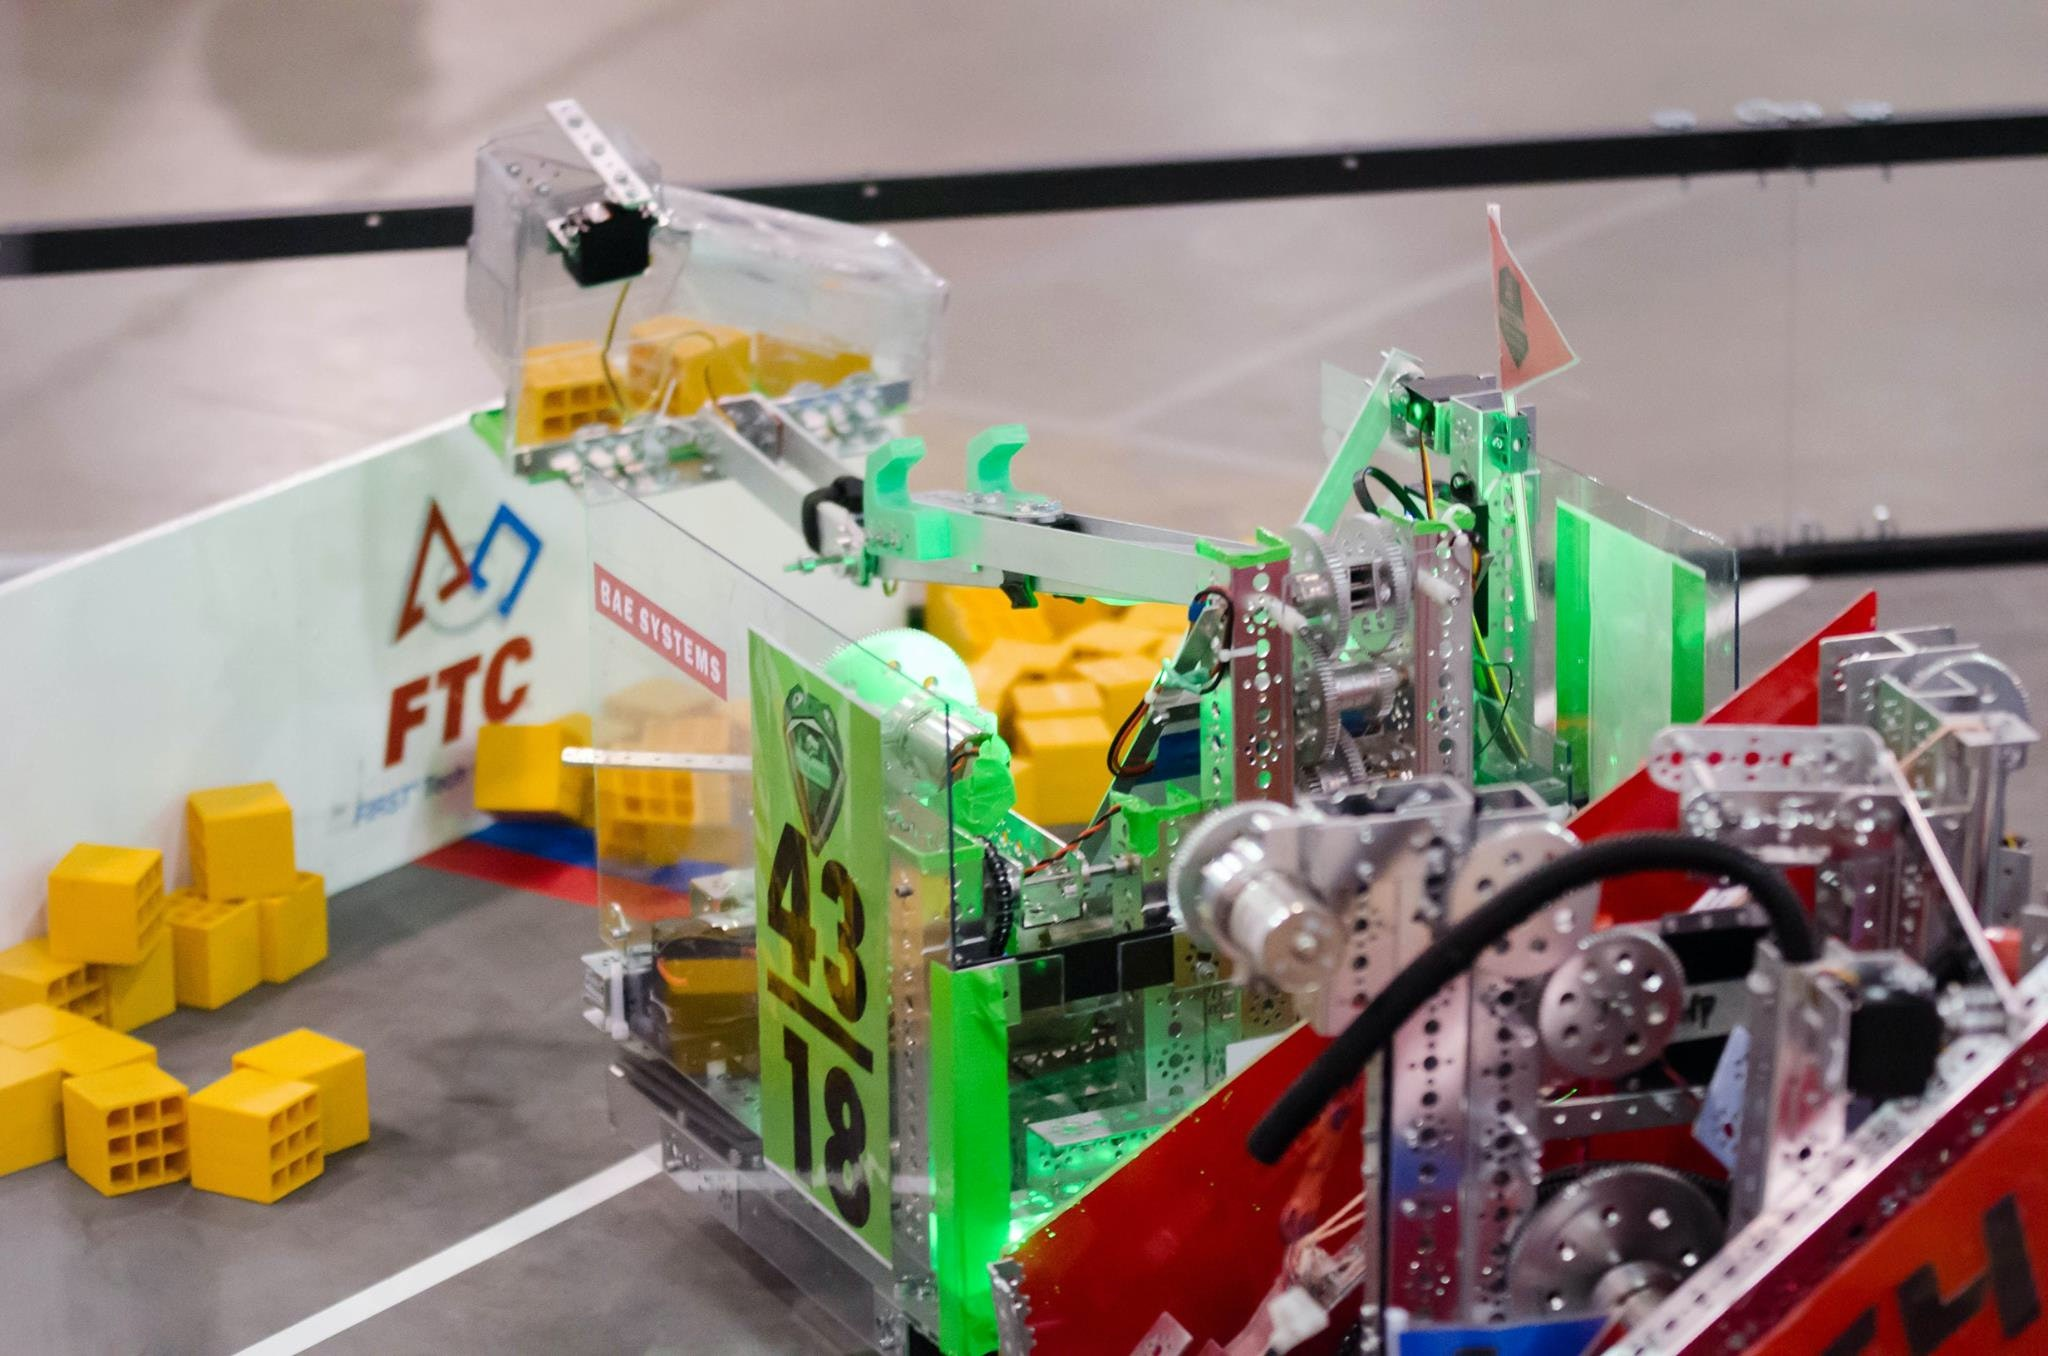 Horizons 4-H Robotics Program